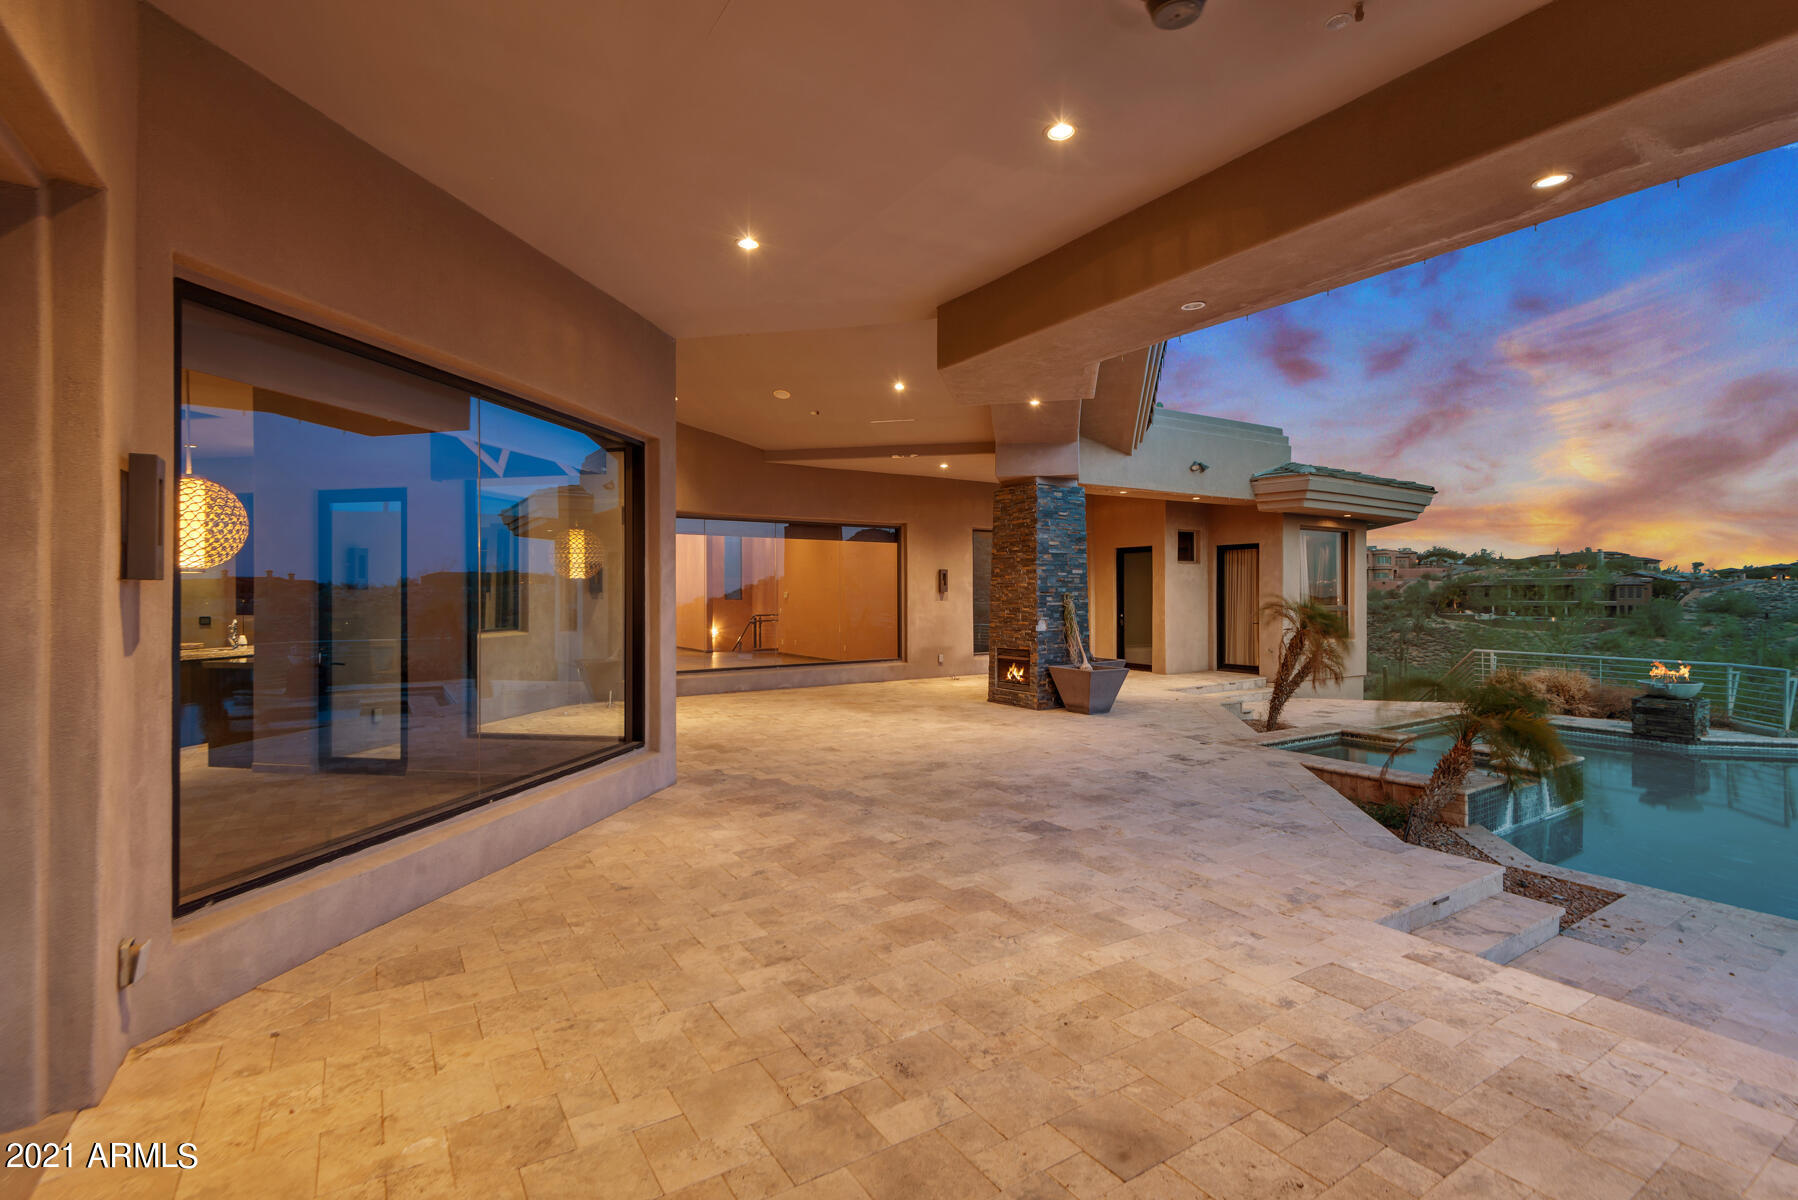 MLS 6268282 14531 E SIERRA ALEGRE Court, Fountain Hills, AZ 85268 Fountain Hills AZ Luxury